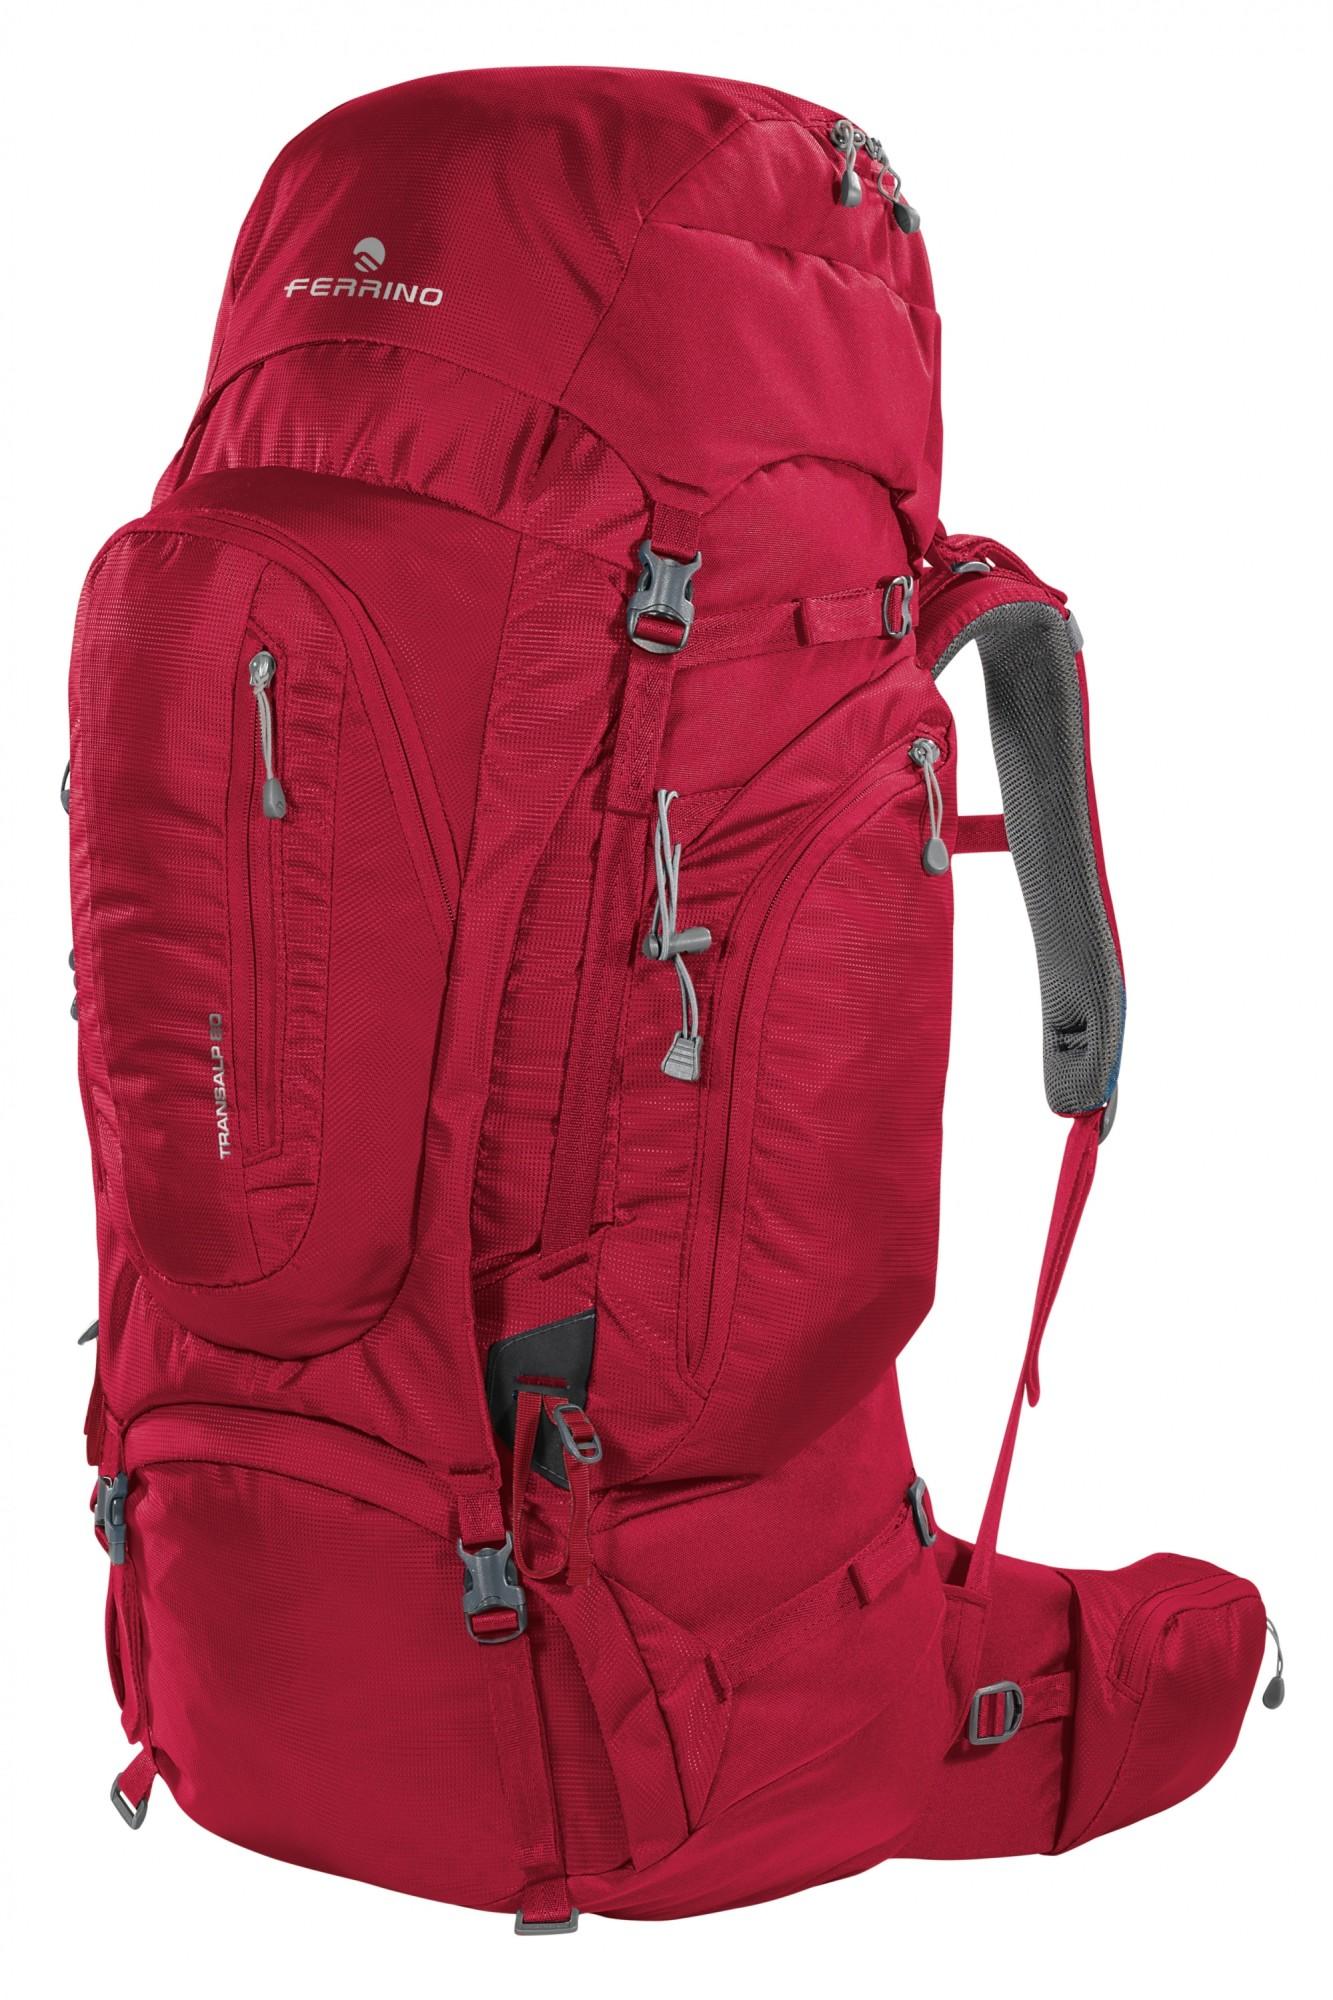 Ferrino Transalp 60 - Hiking backpack